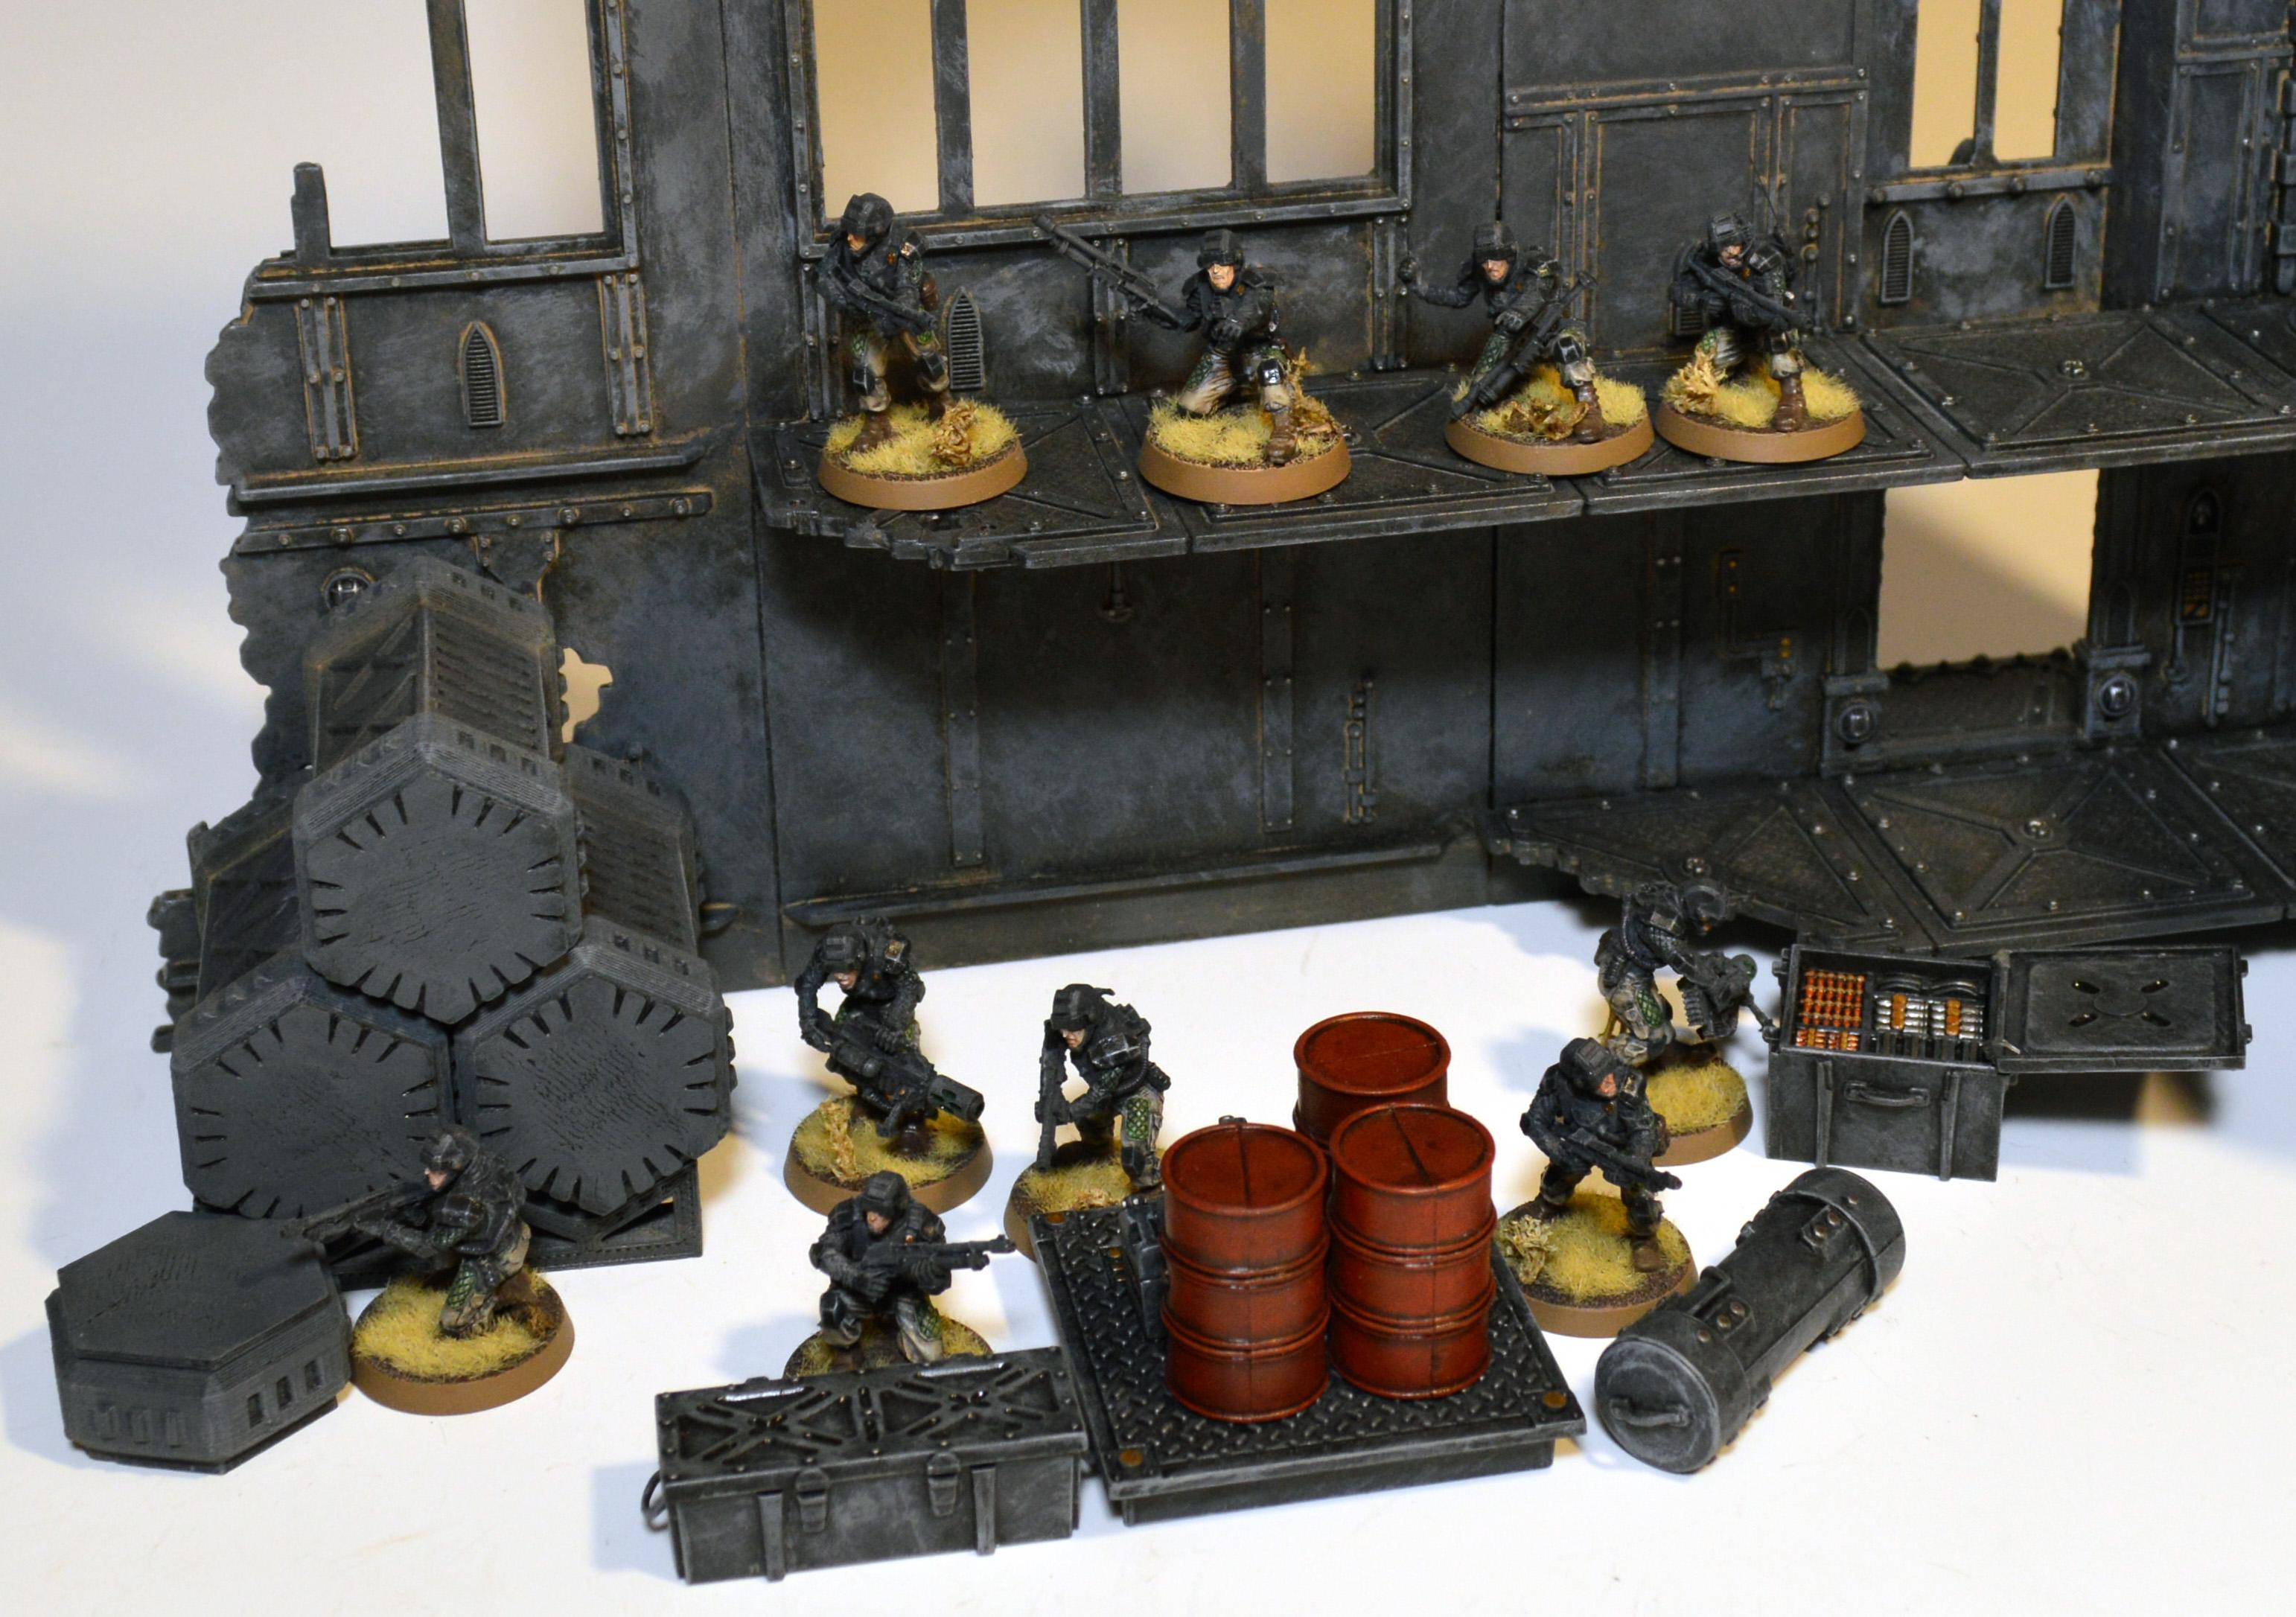 Elysian, Imperial Guard, Terrain, Warhammer 40,000